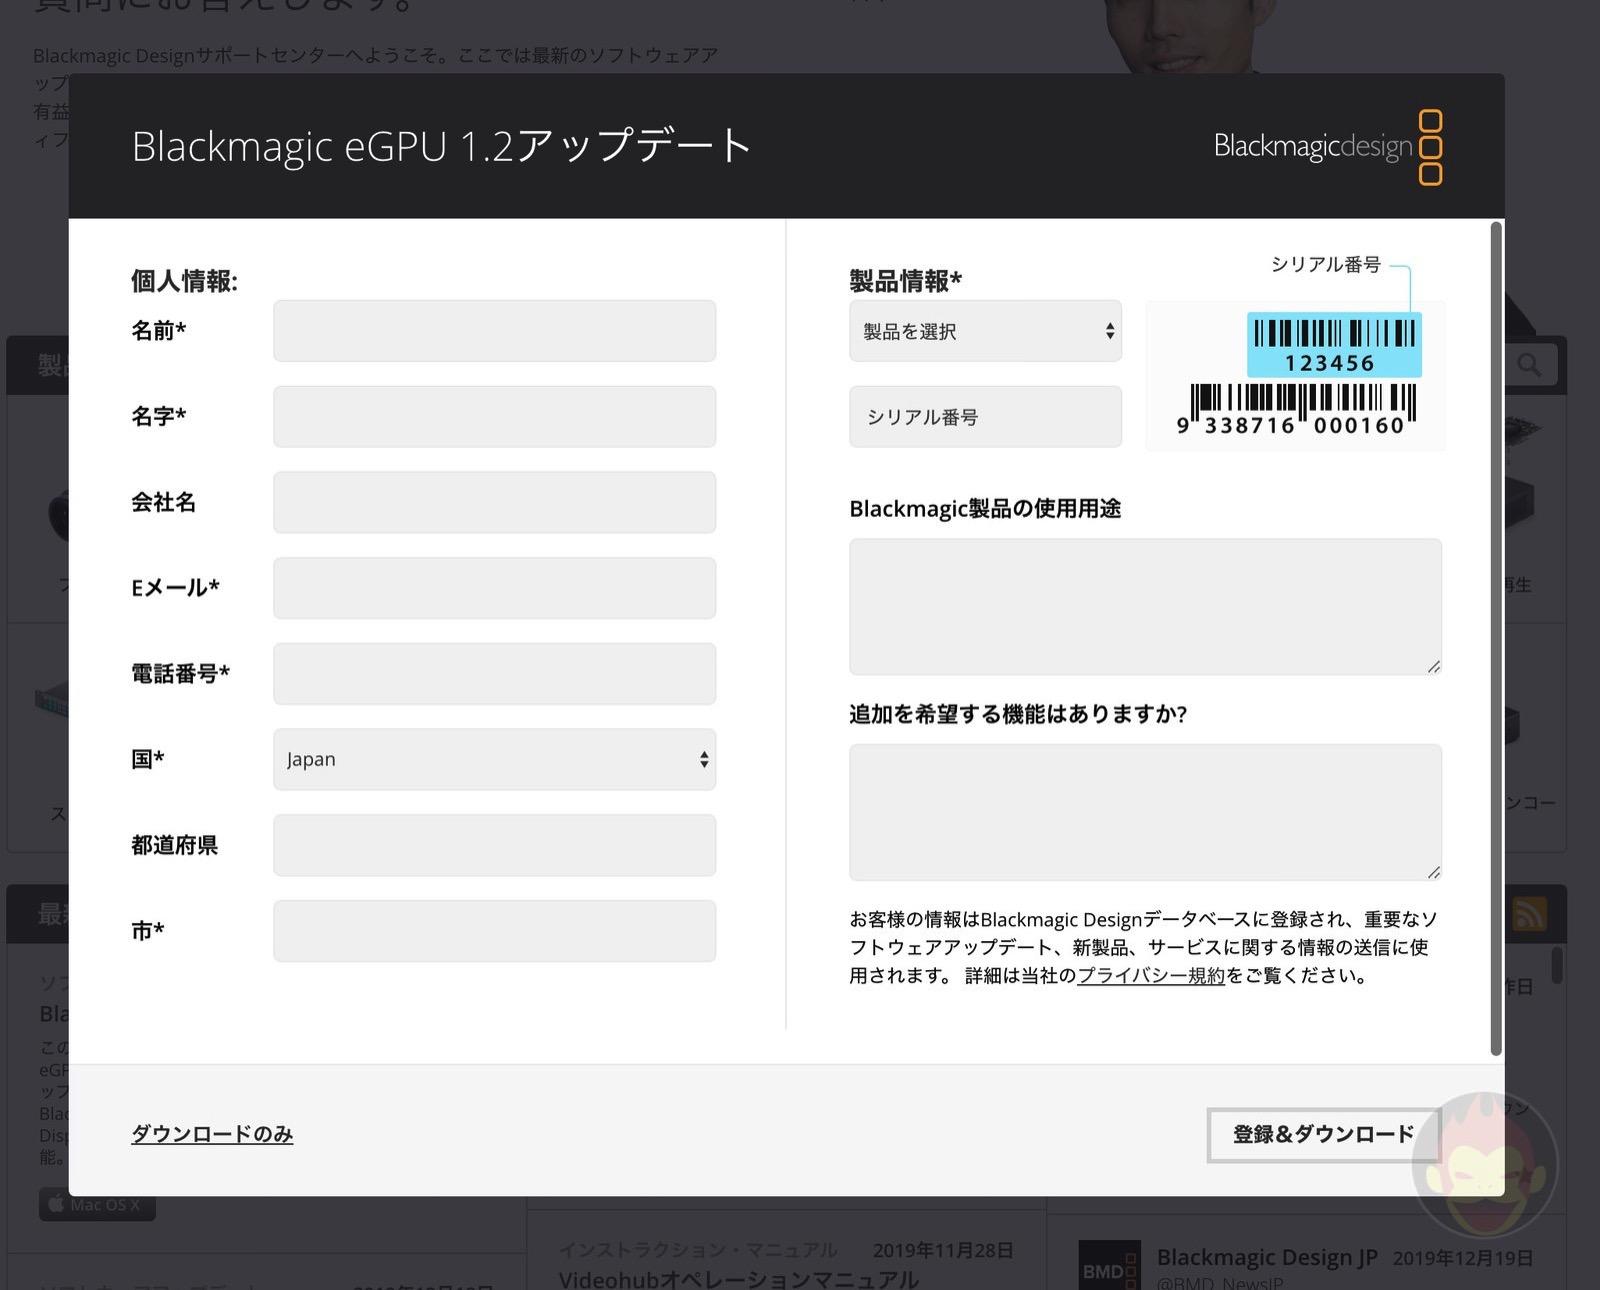 How to update blackmagic egpu firmware 02